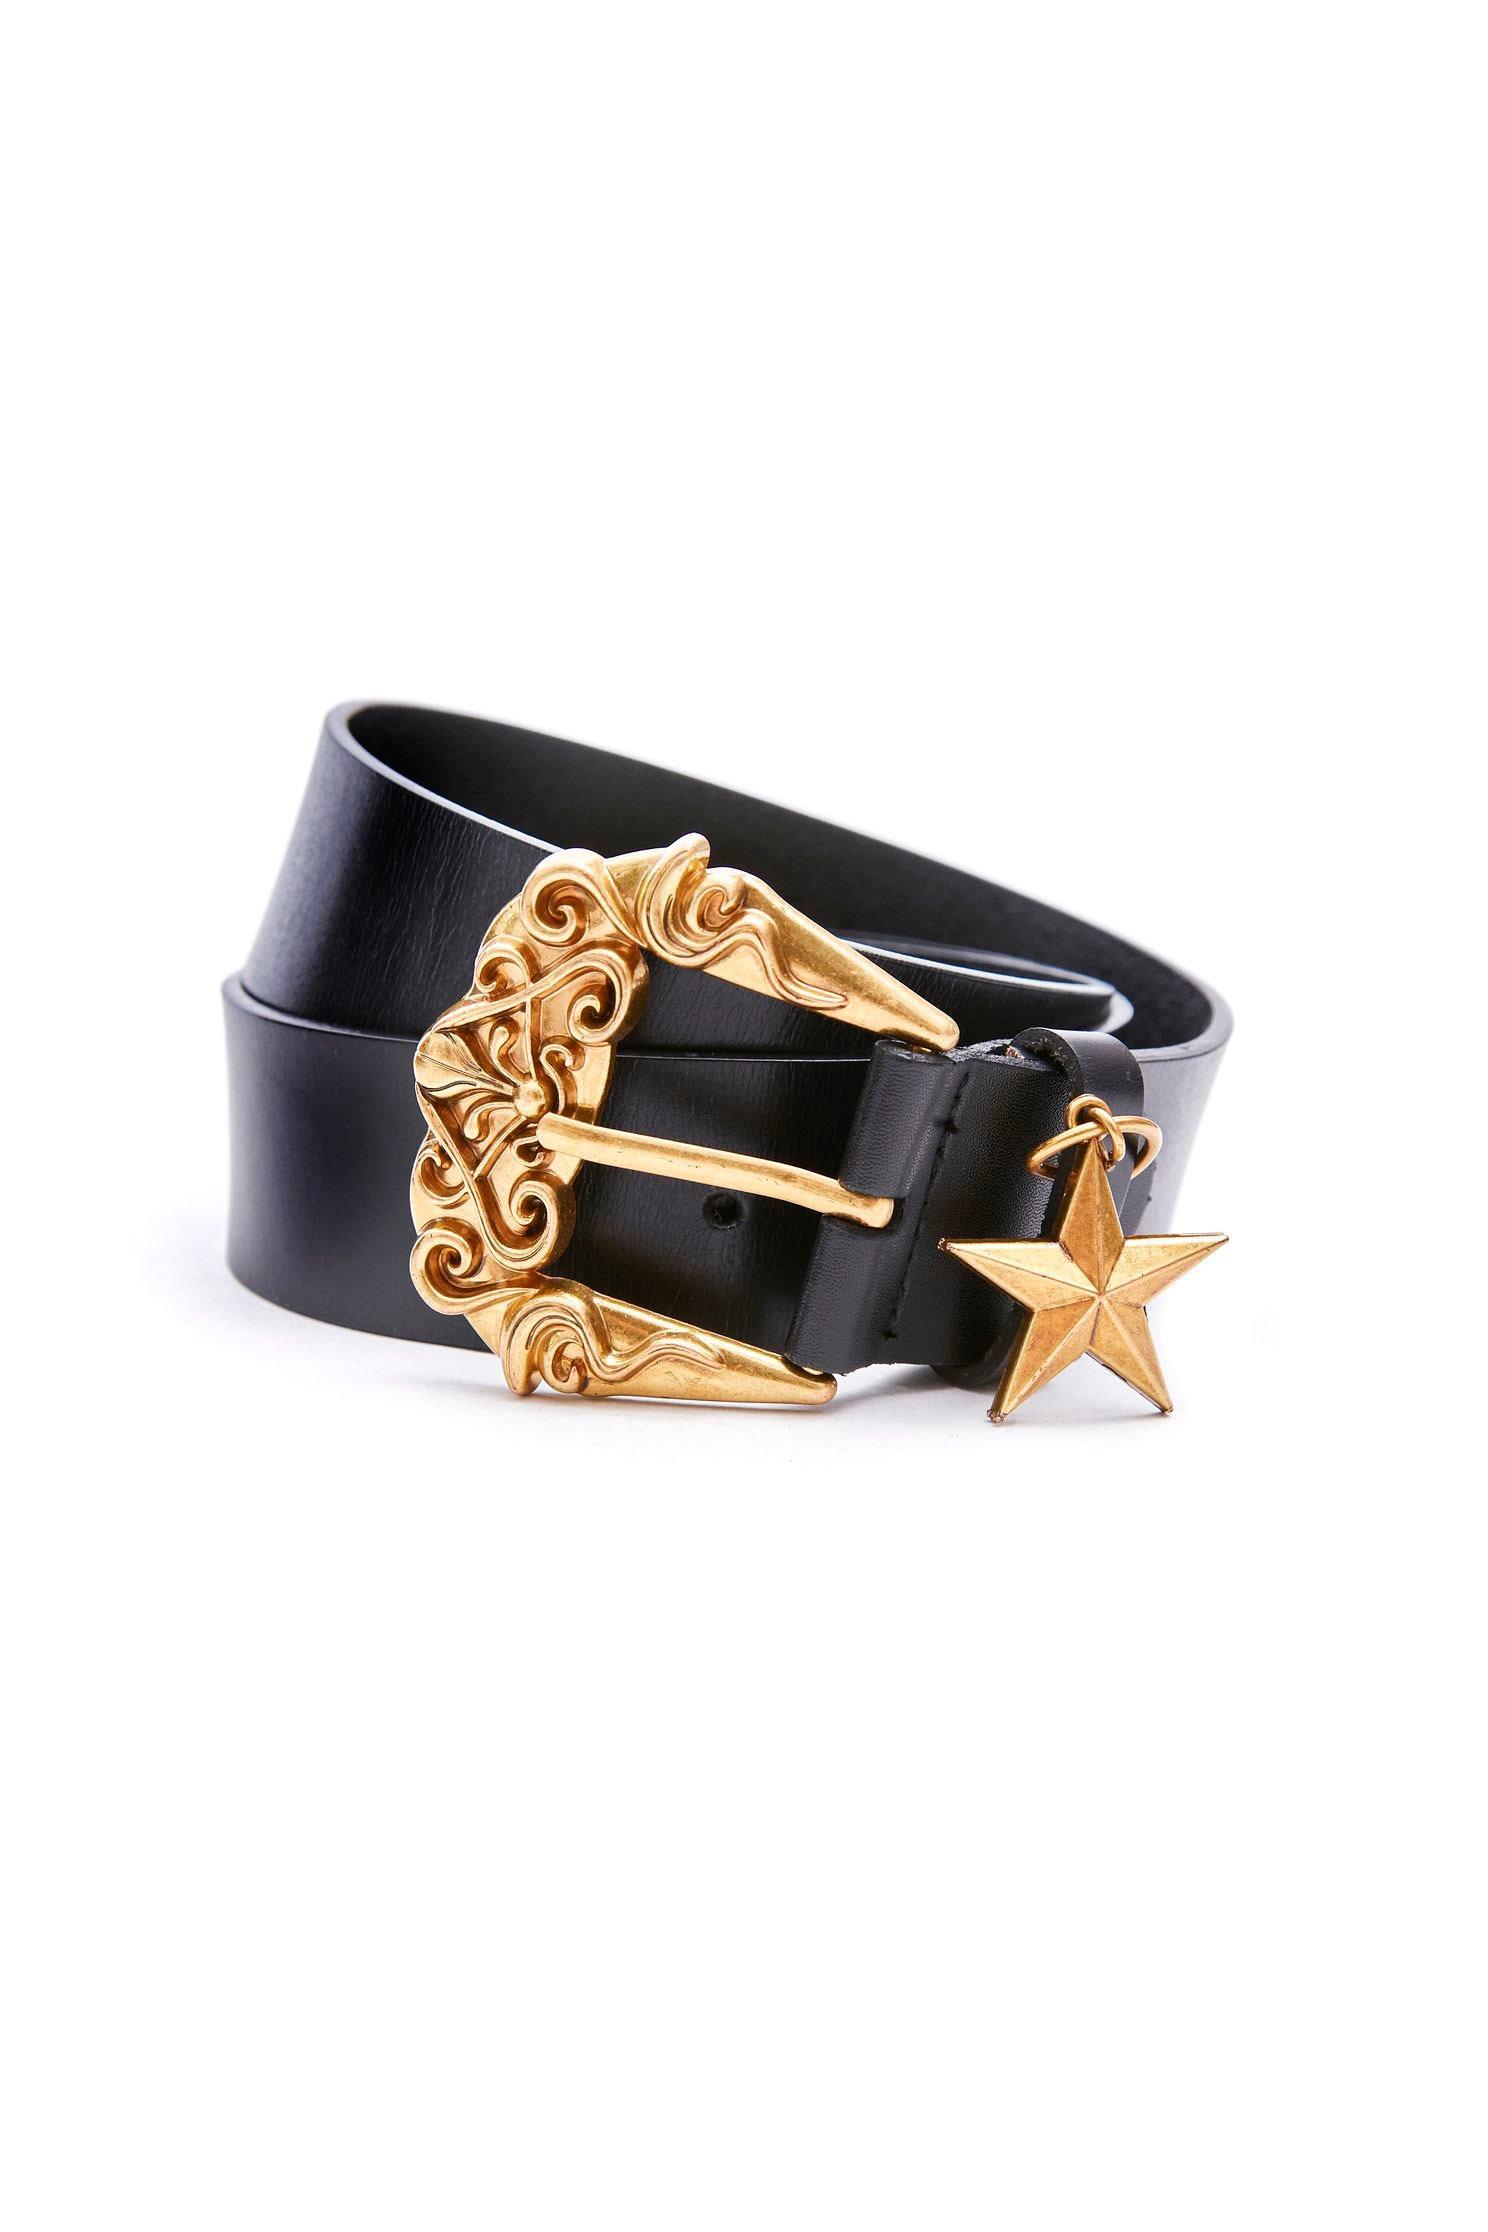 Gorgeous star pendant belt,Belt,腰帶